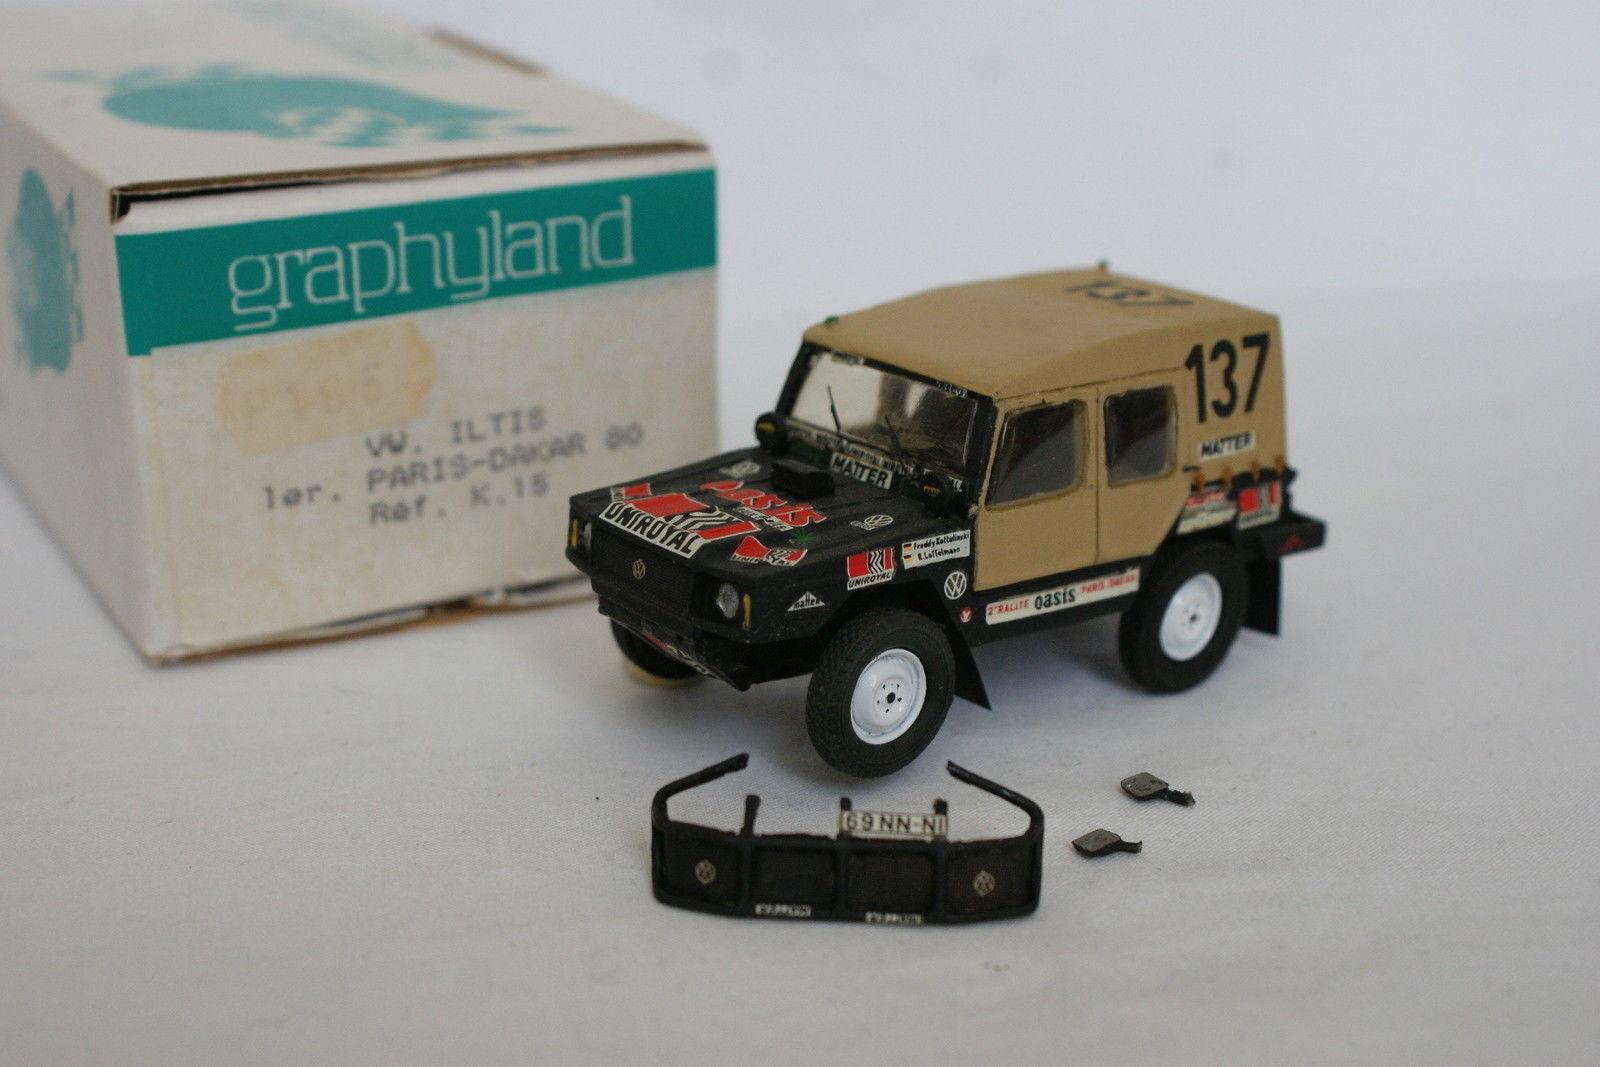 Graphyland Kit montato 1 43 - - - VW Iltis Winner Parigi Dakar 1980 8a4dd3